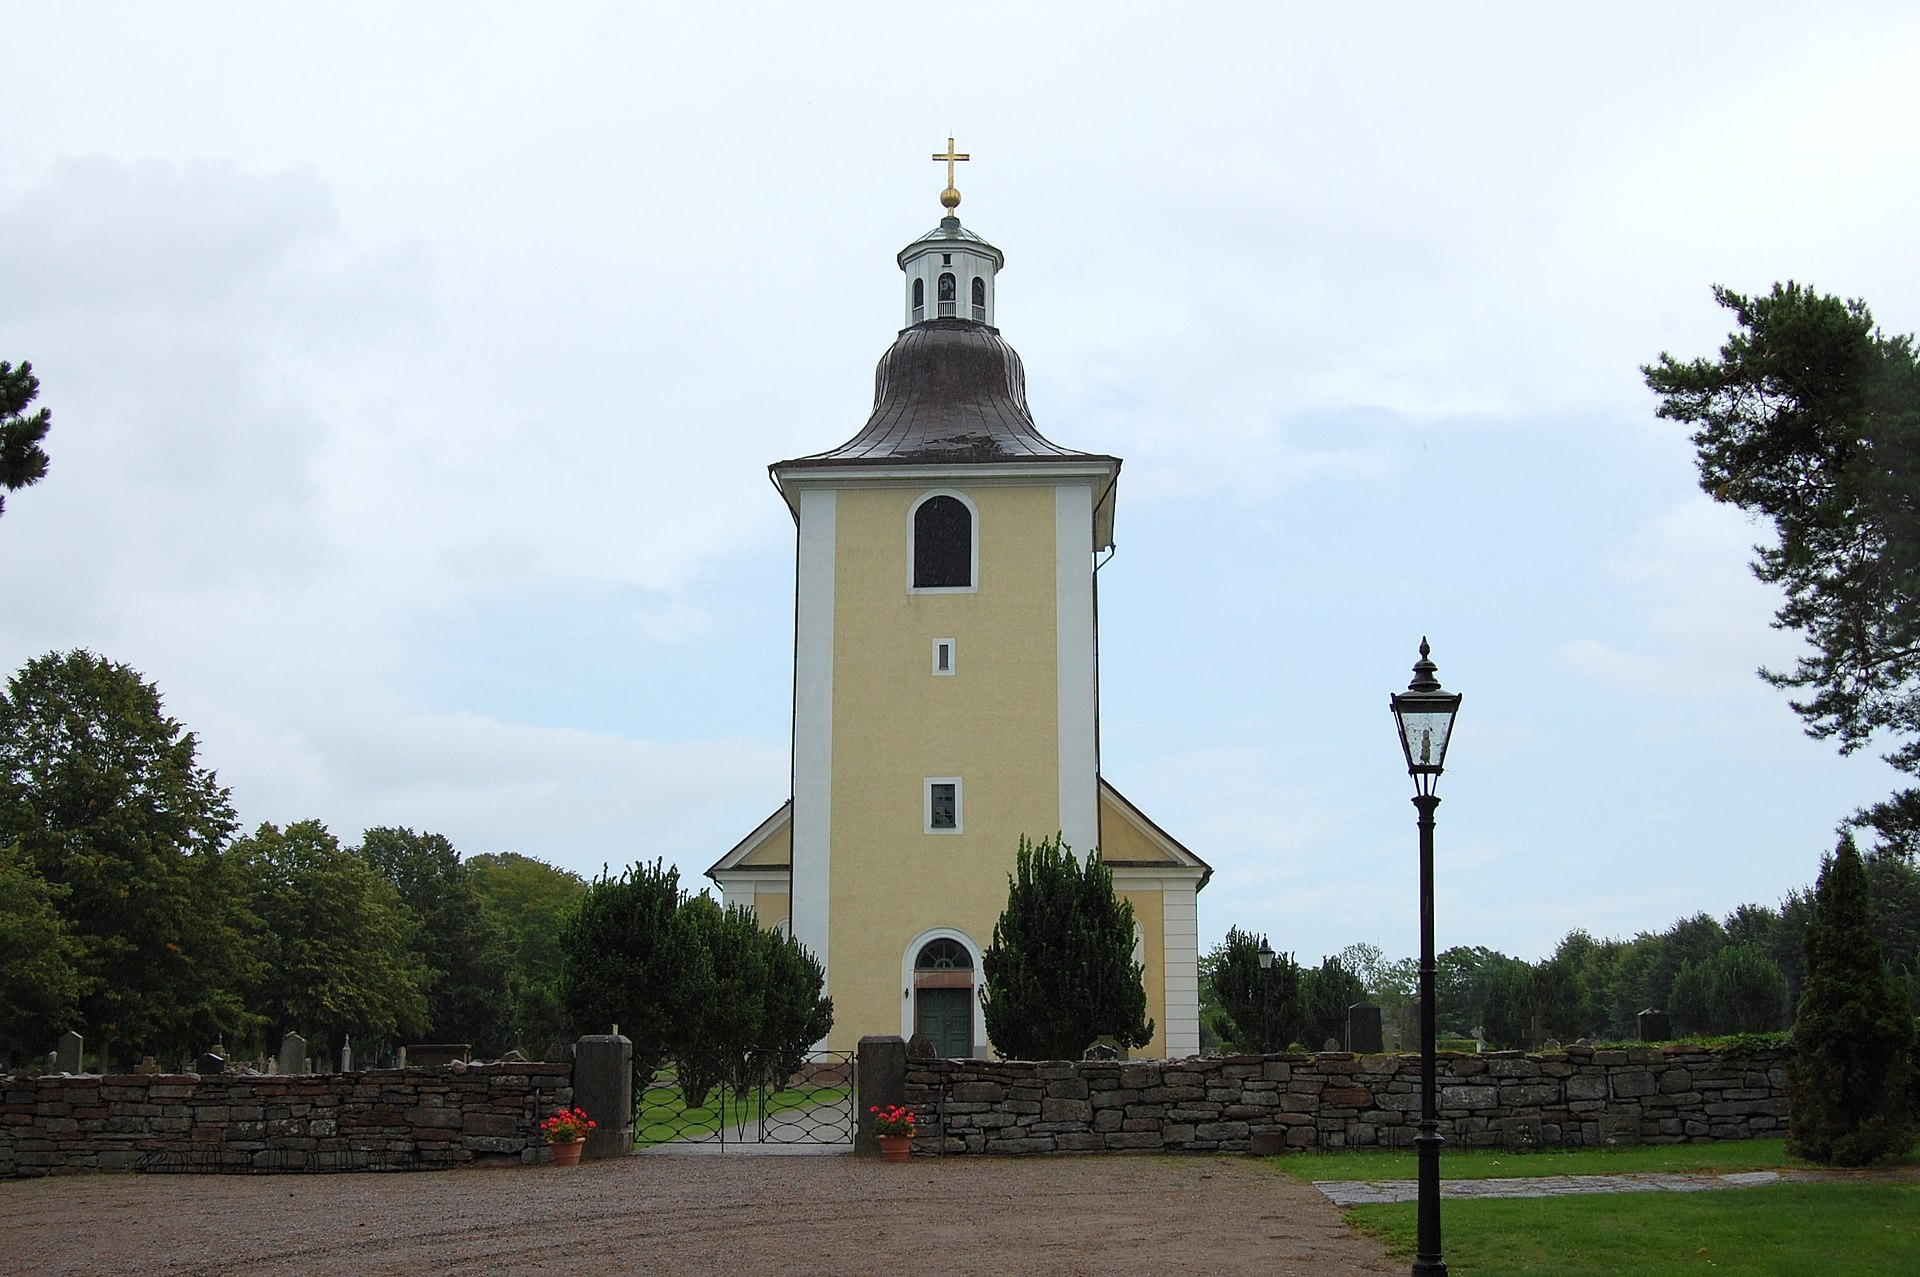 Högby